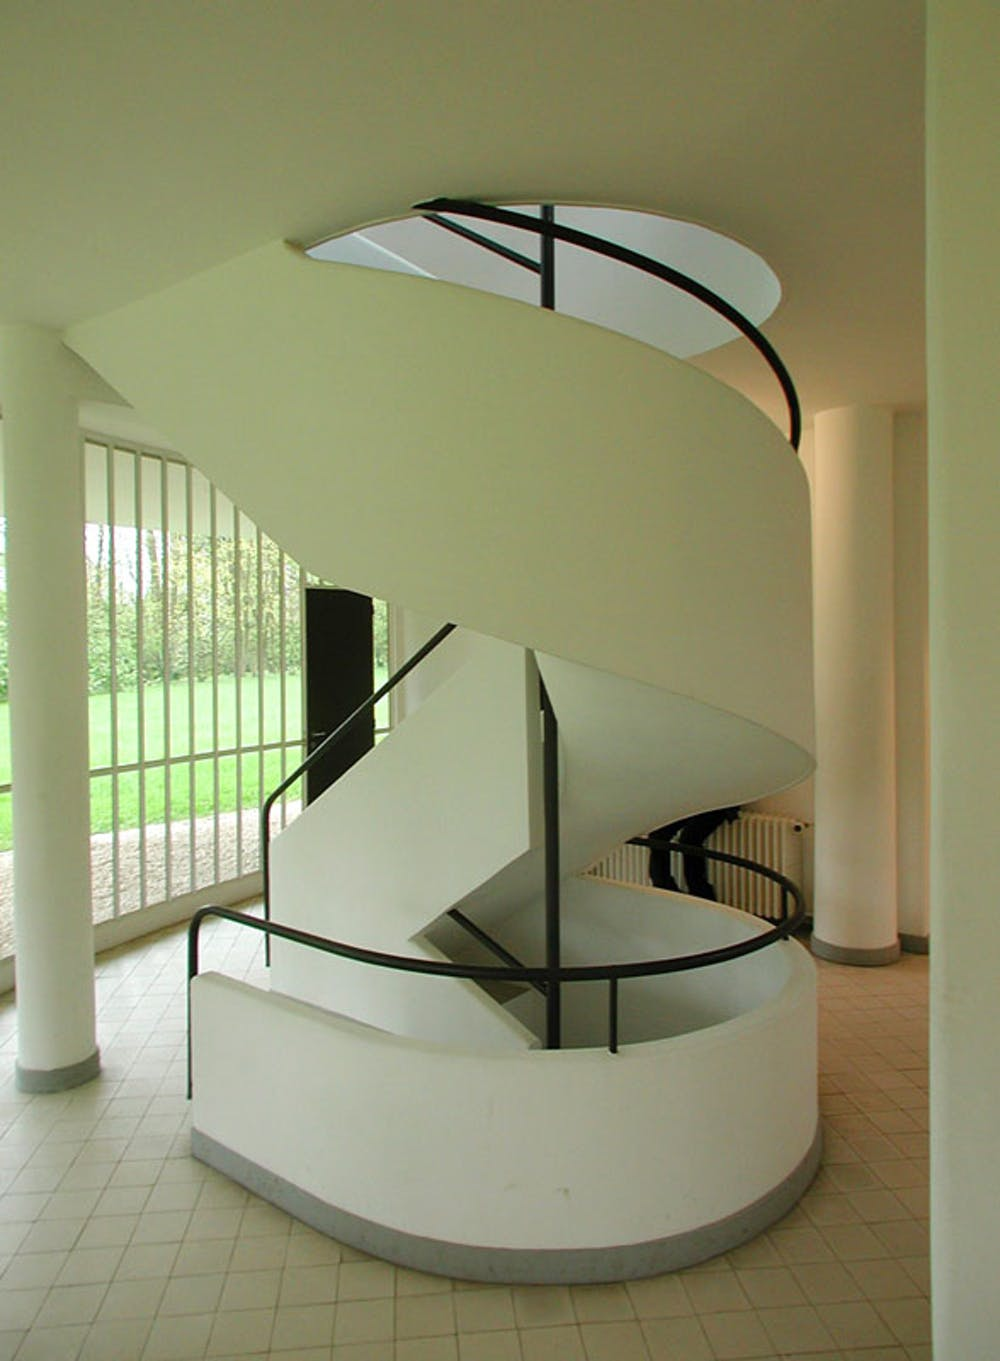 Le corbusier villa savoye interior - Villa Savoye Waywuwei